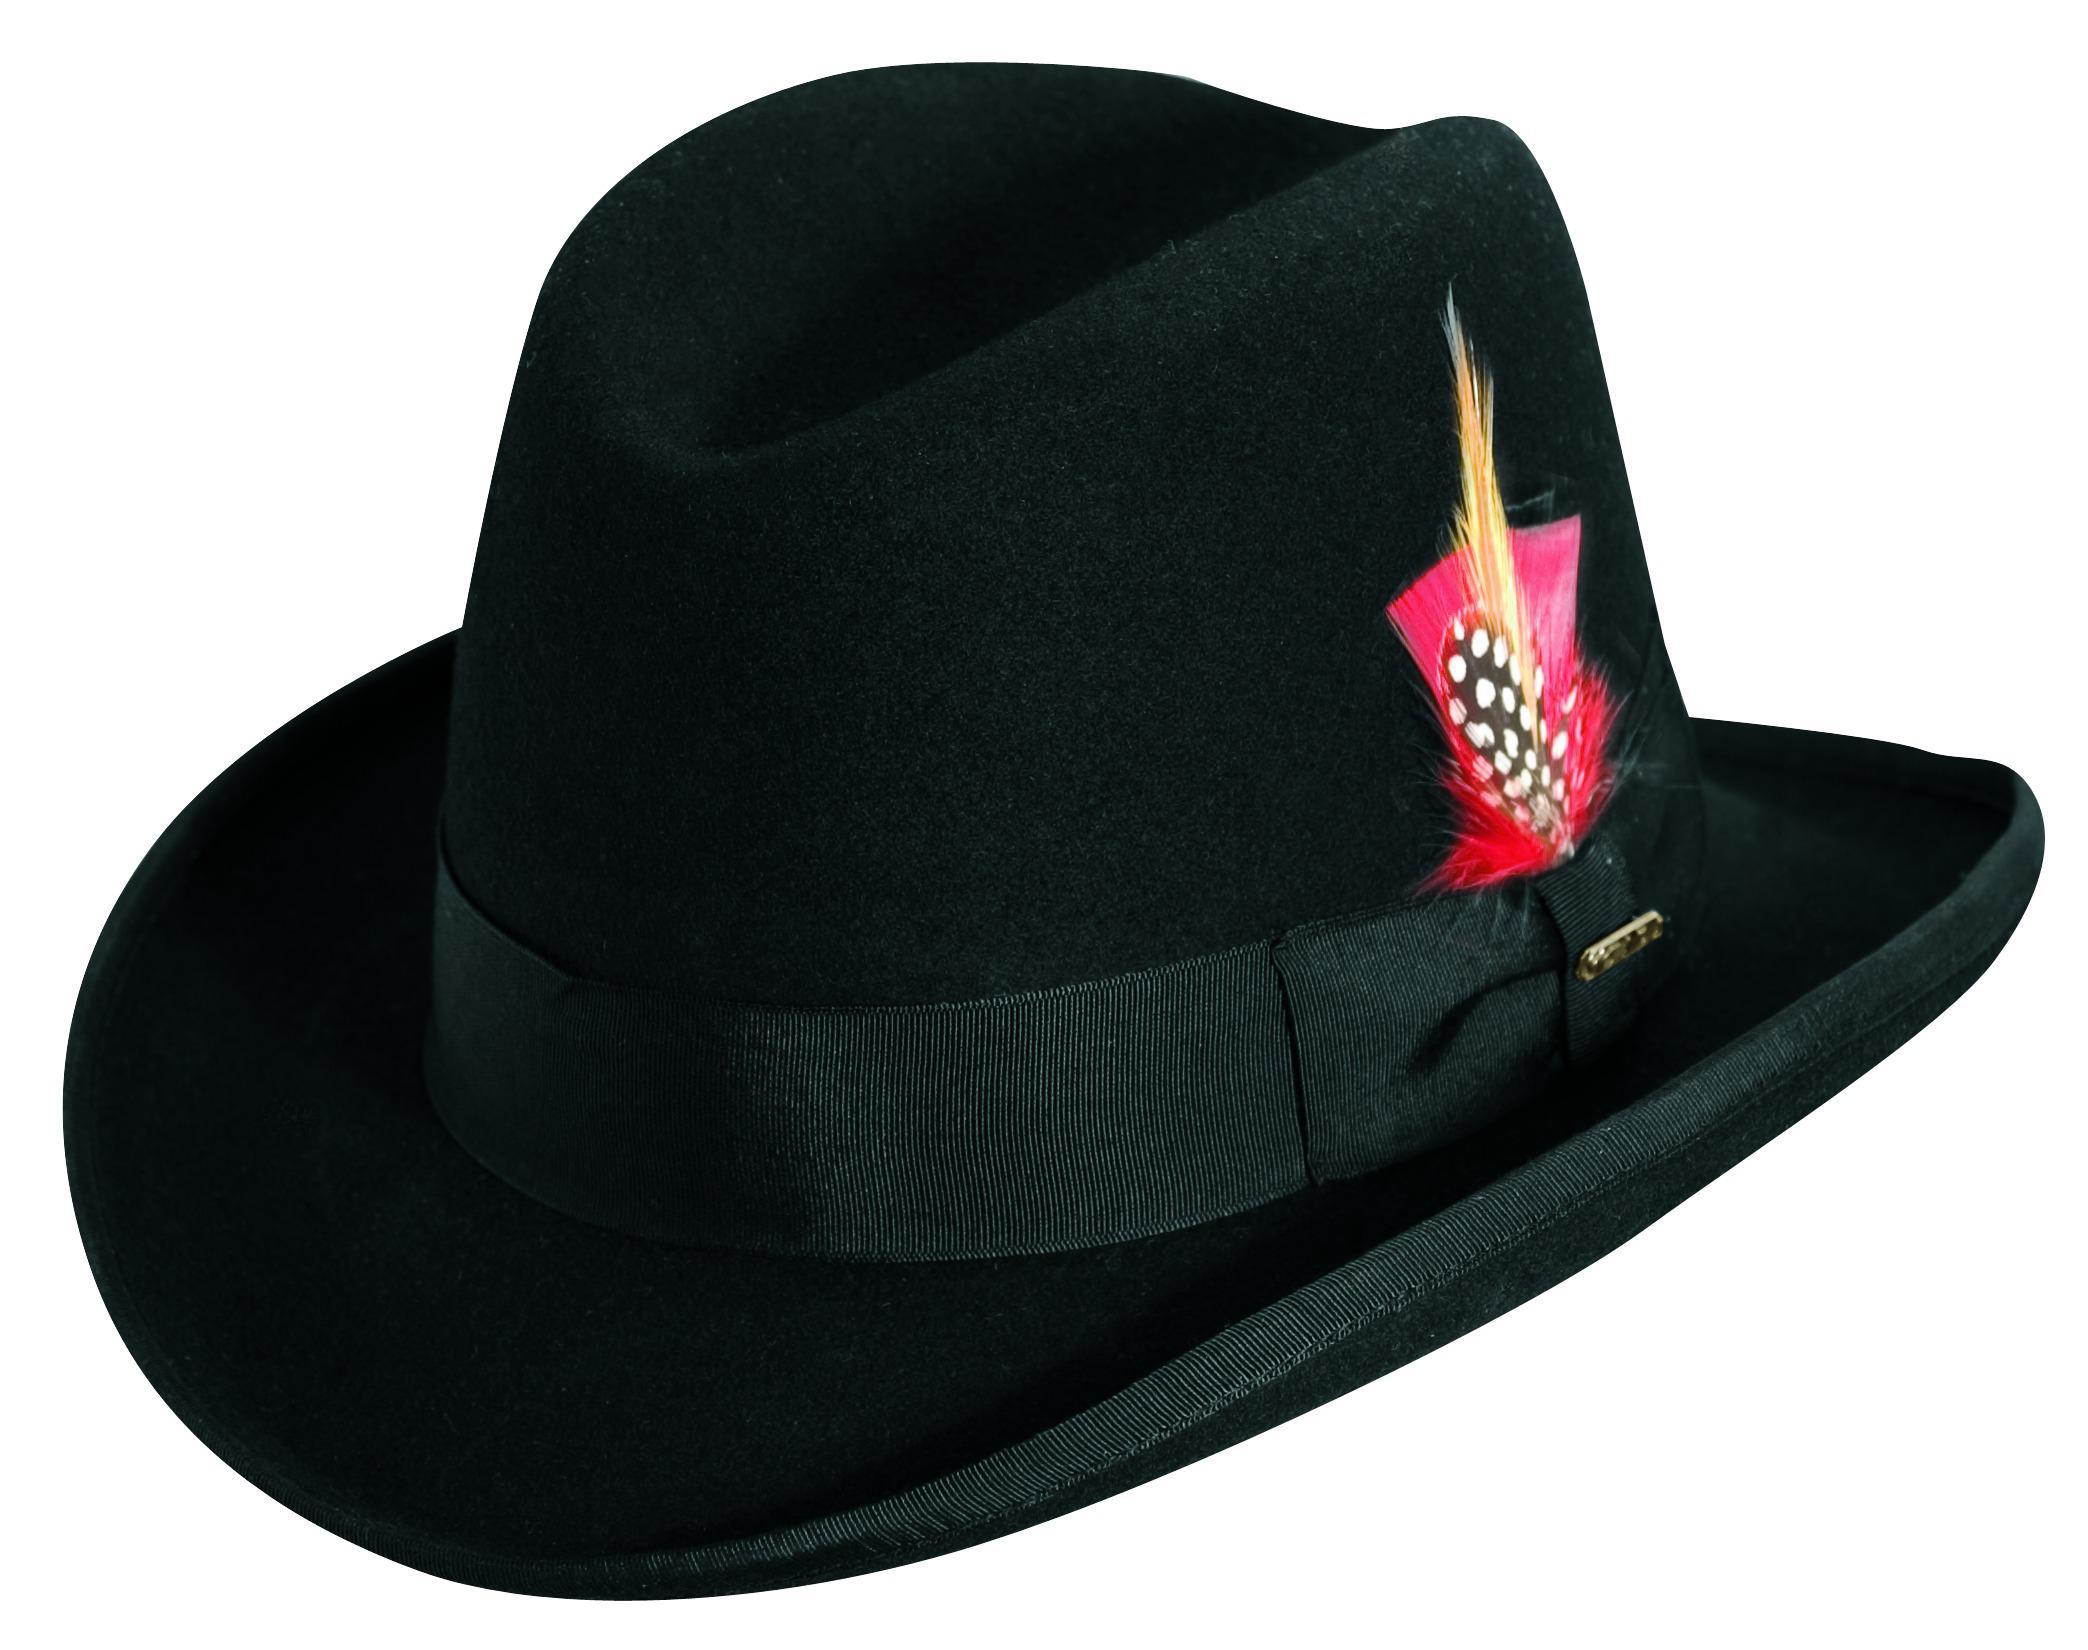 2743d67c211 Scala Men s Wool Felt Winter Homburg Hat